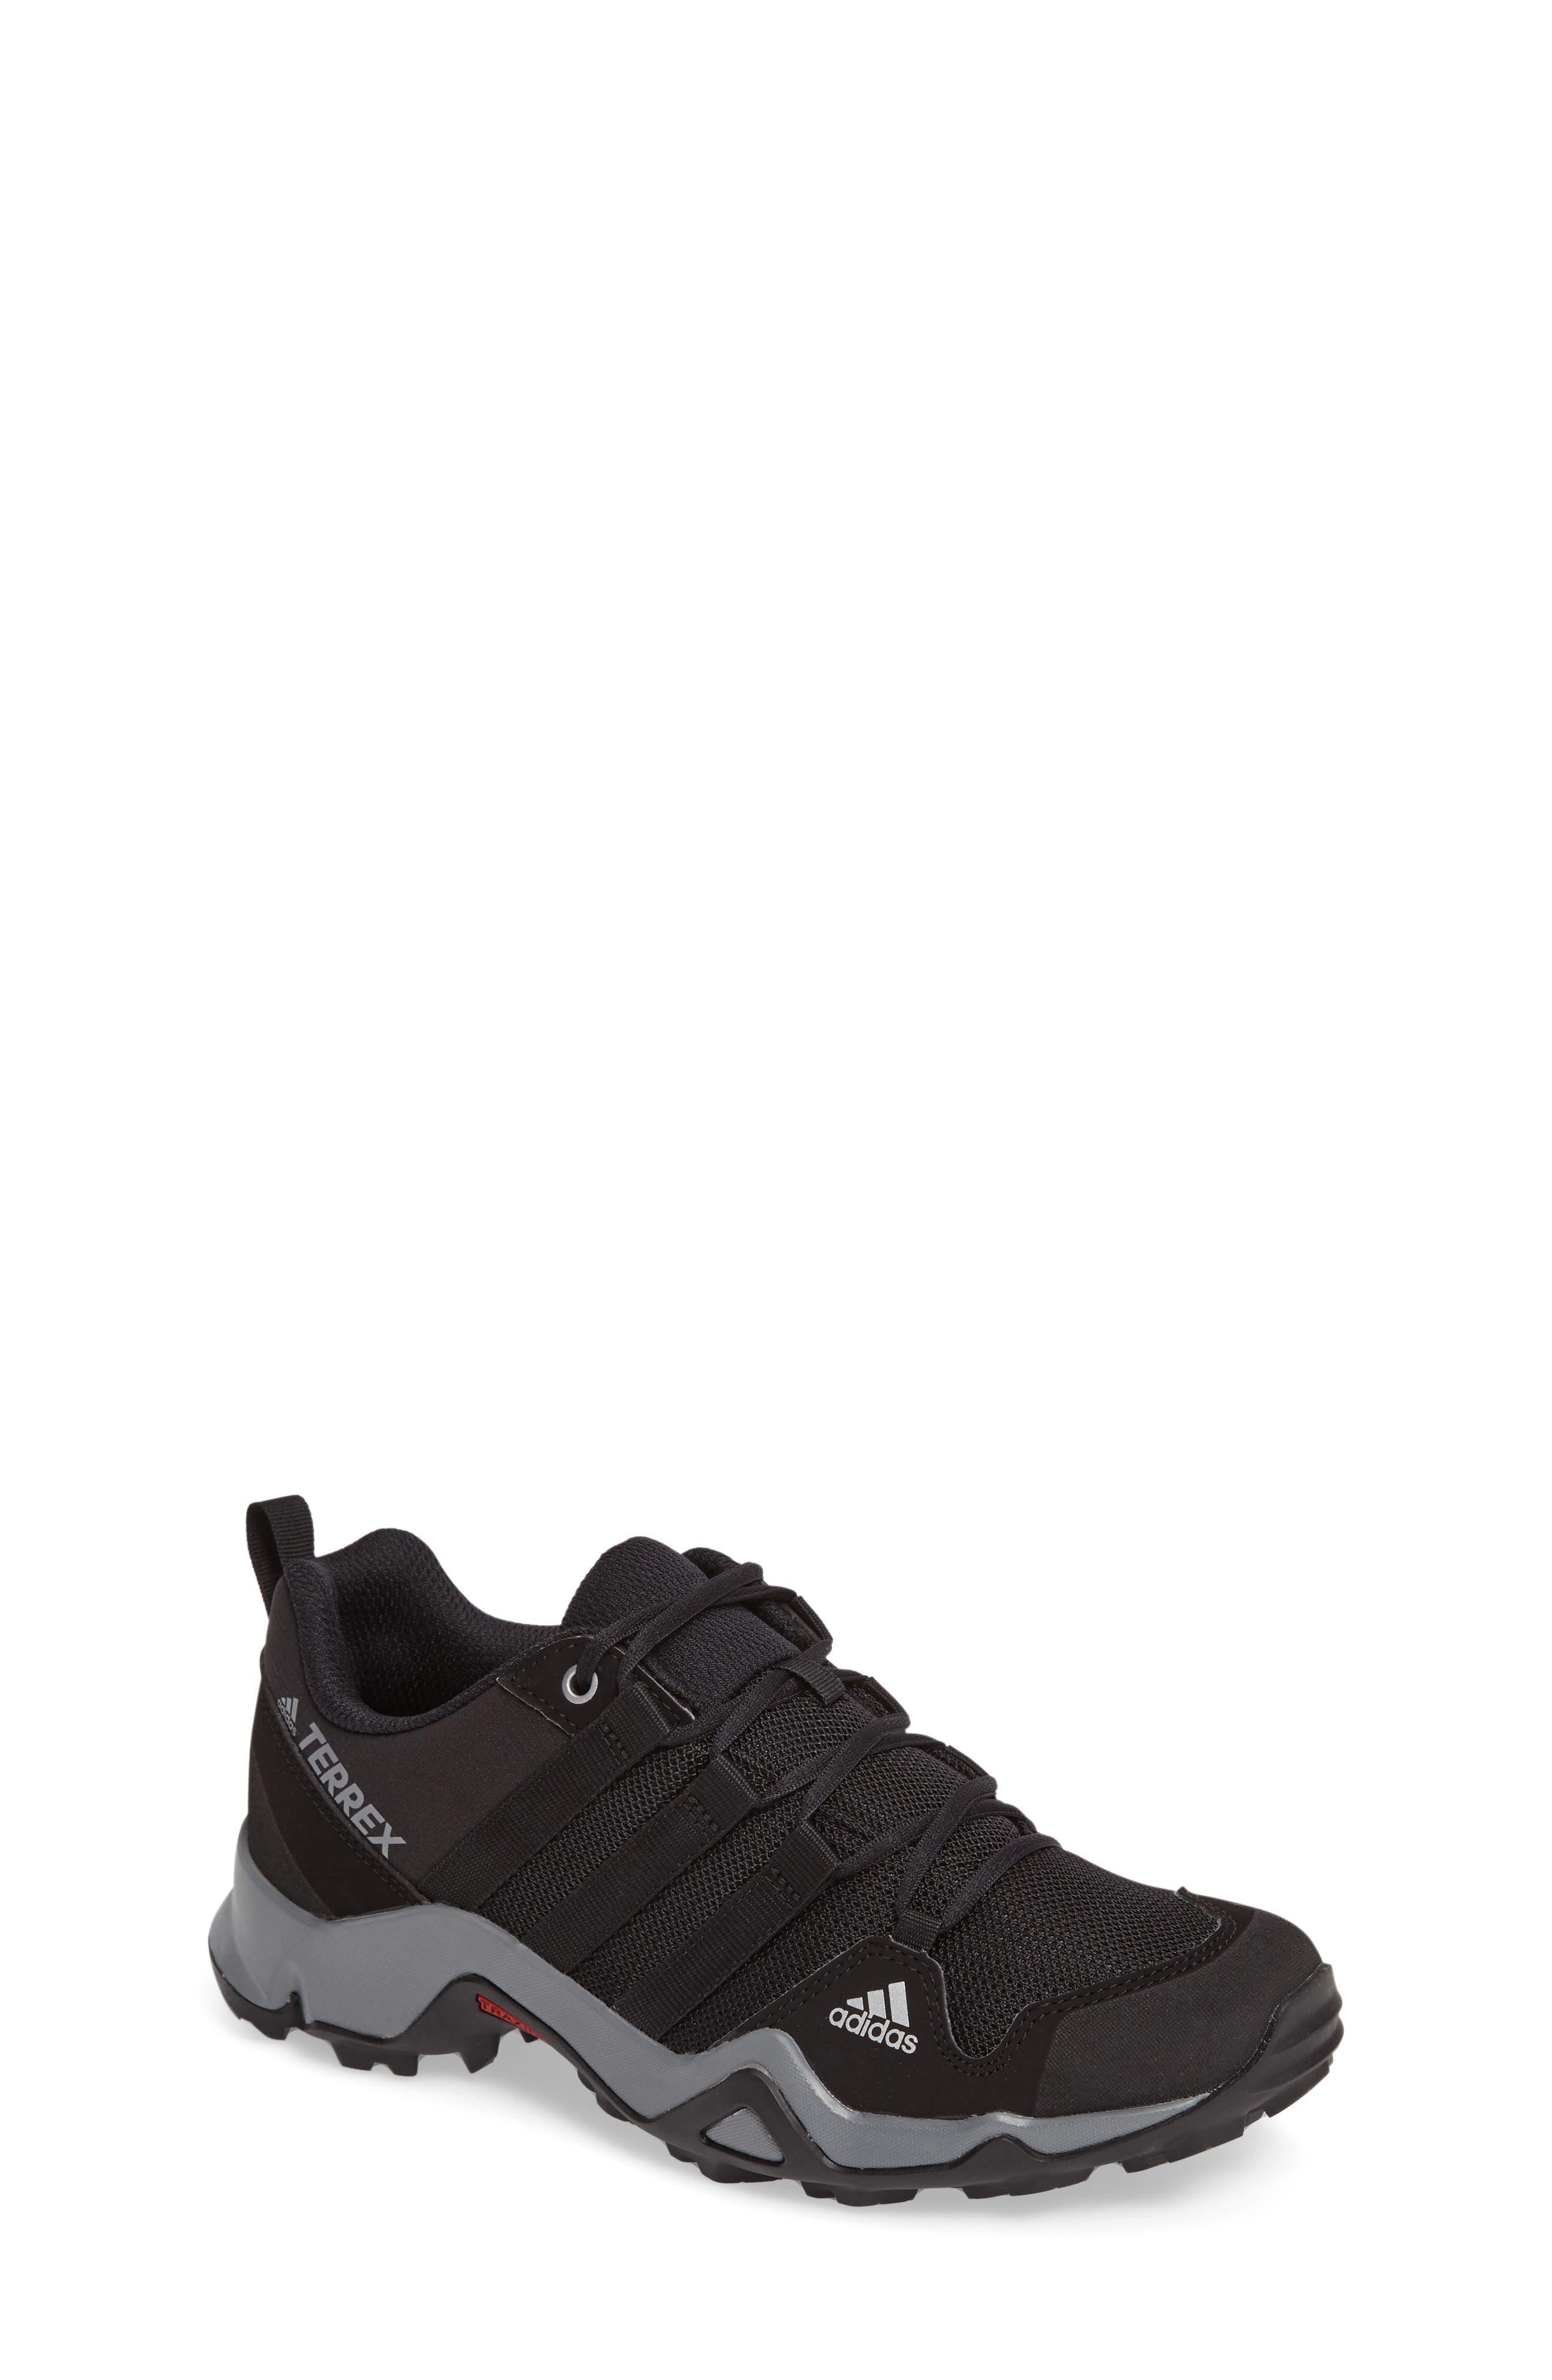 Alternate Image 1 Selected - adidas Terrex AX2R Hiking Shoe (Toddler, Little Kid & Big Kid)